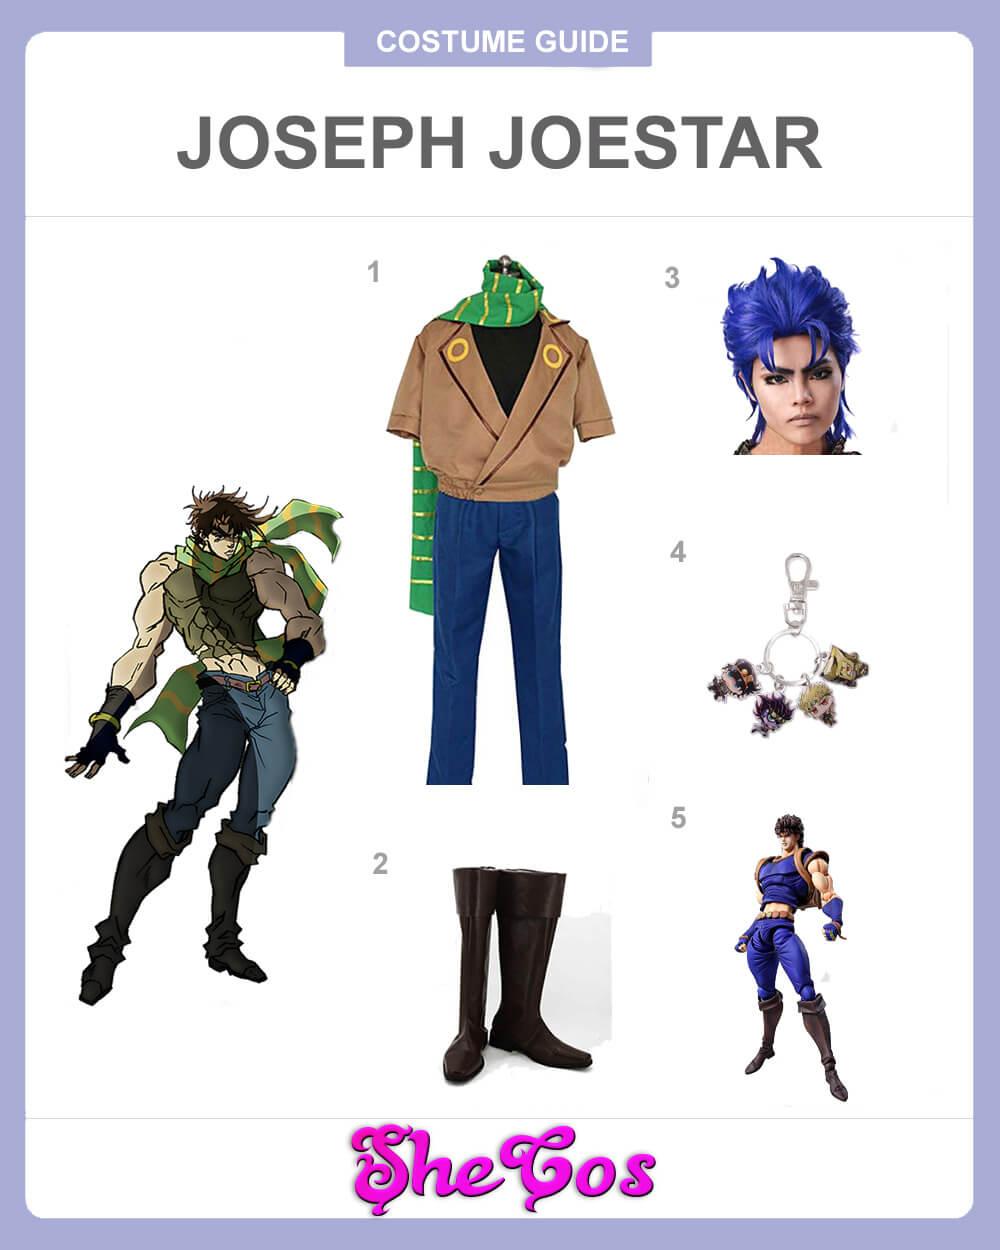 joseph joestar cosplay guide